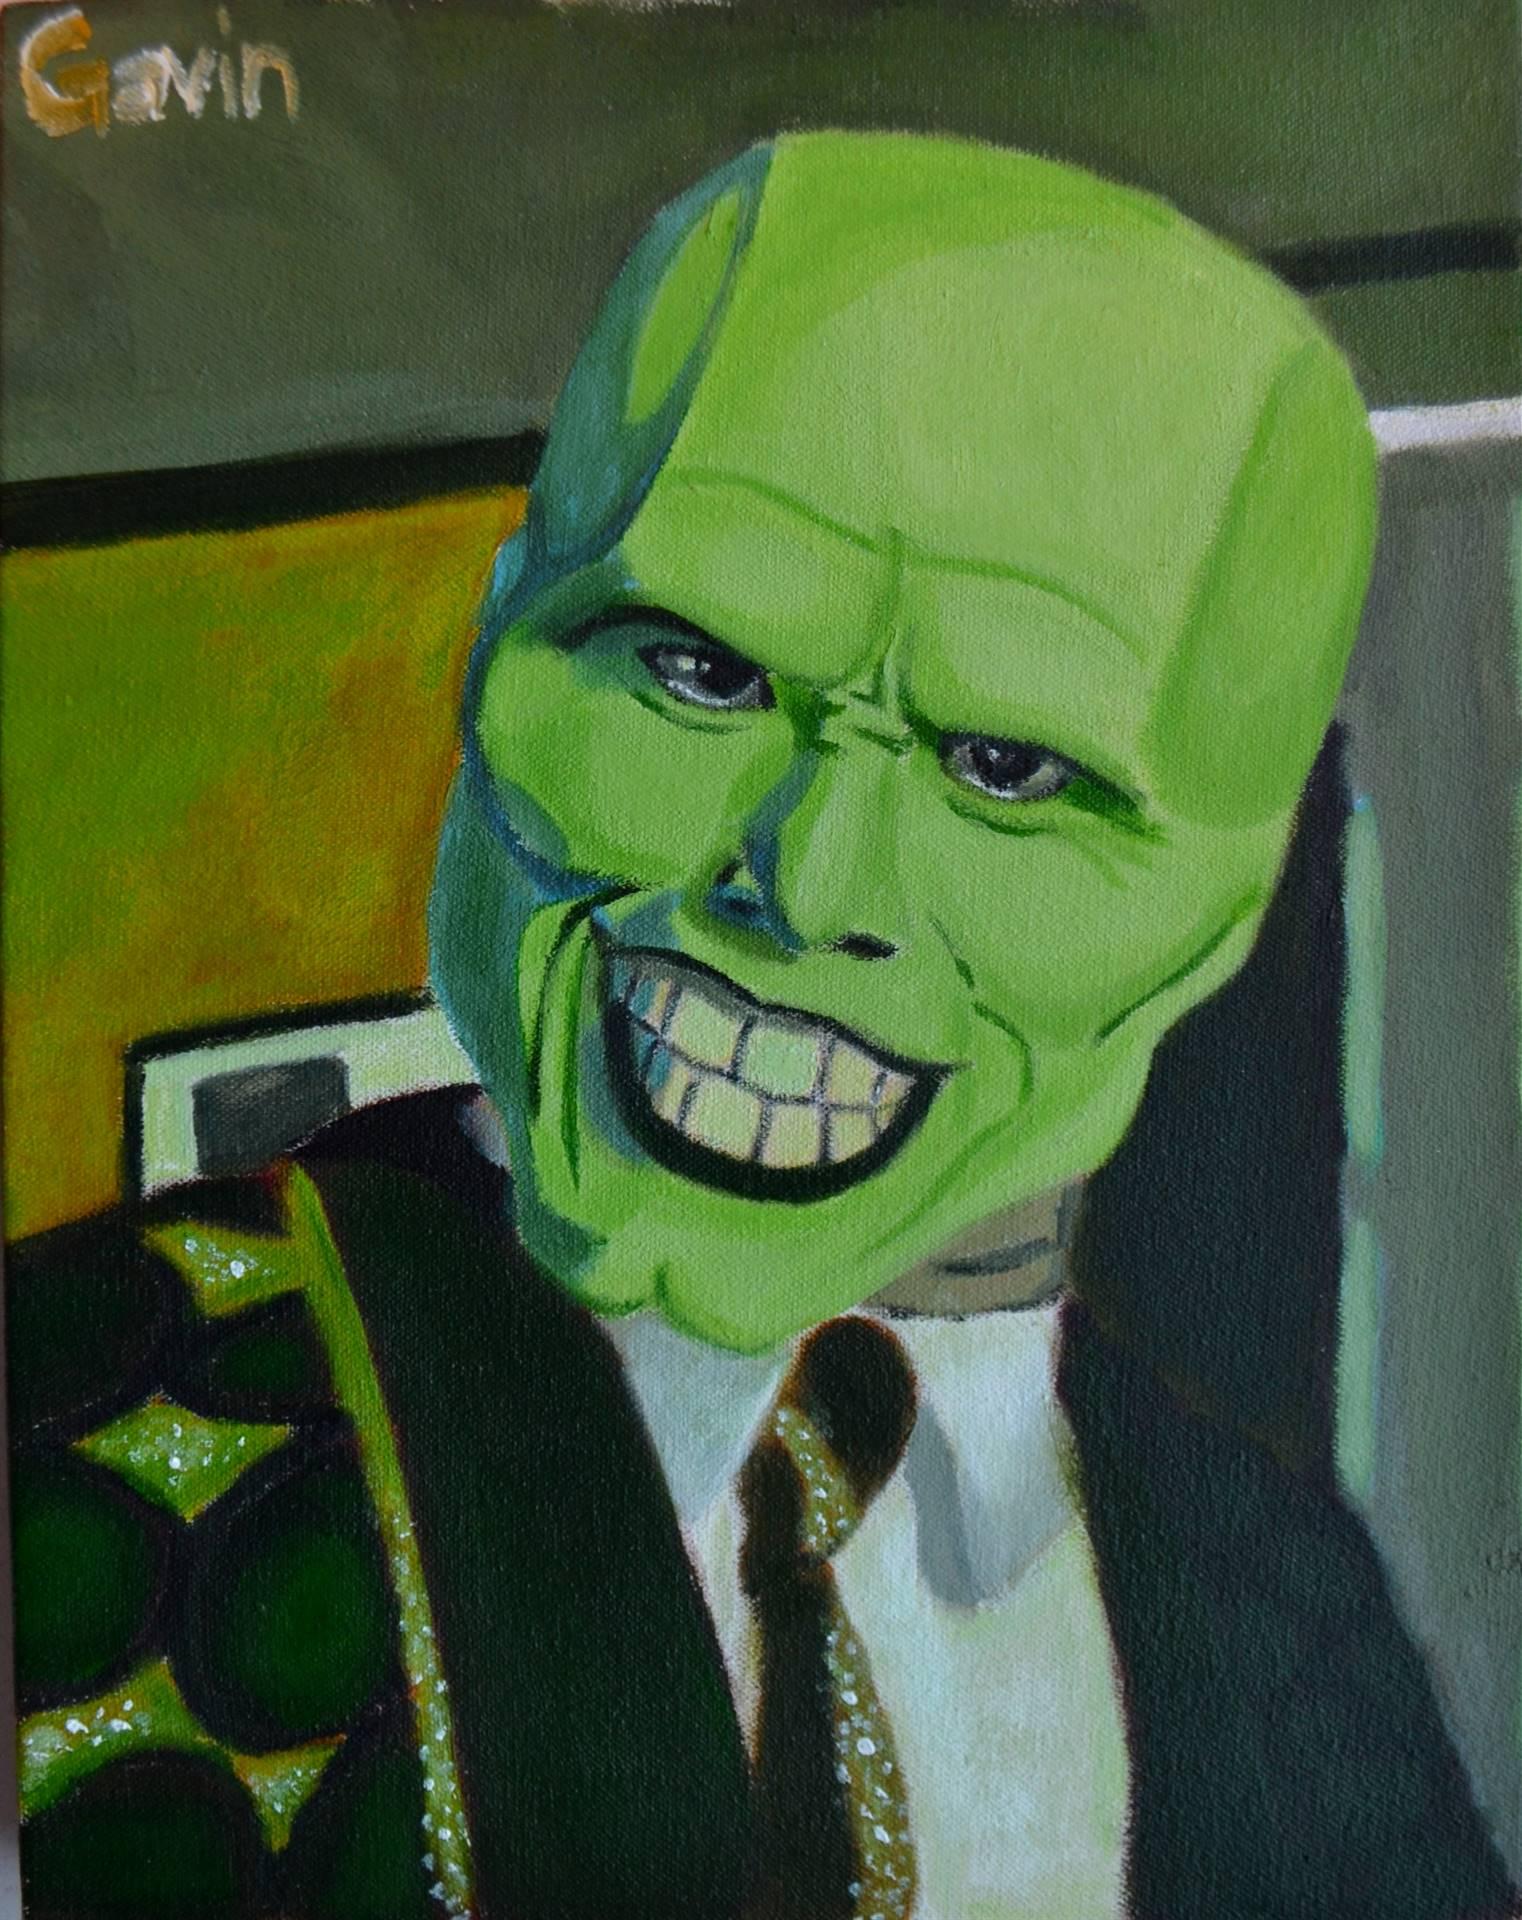 Gavin Bocanegra, The Mask, acrylic on canvas, 14 x 11, 2016